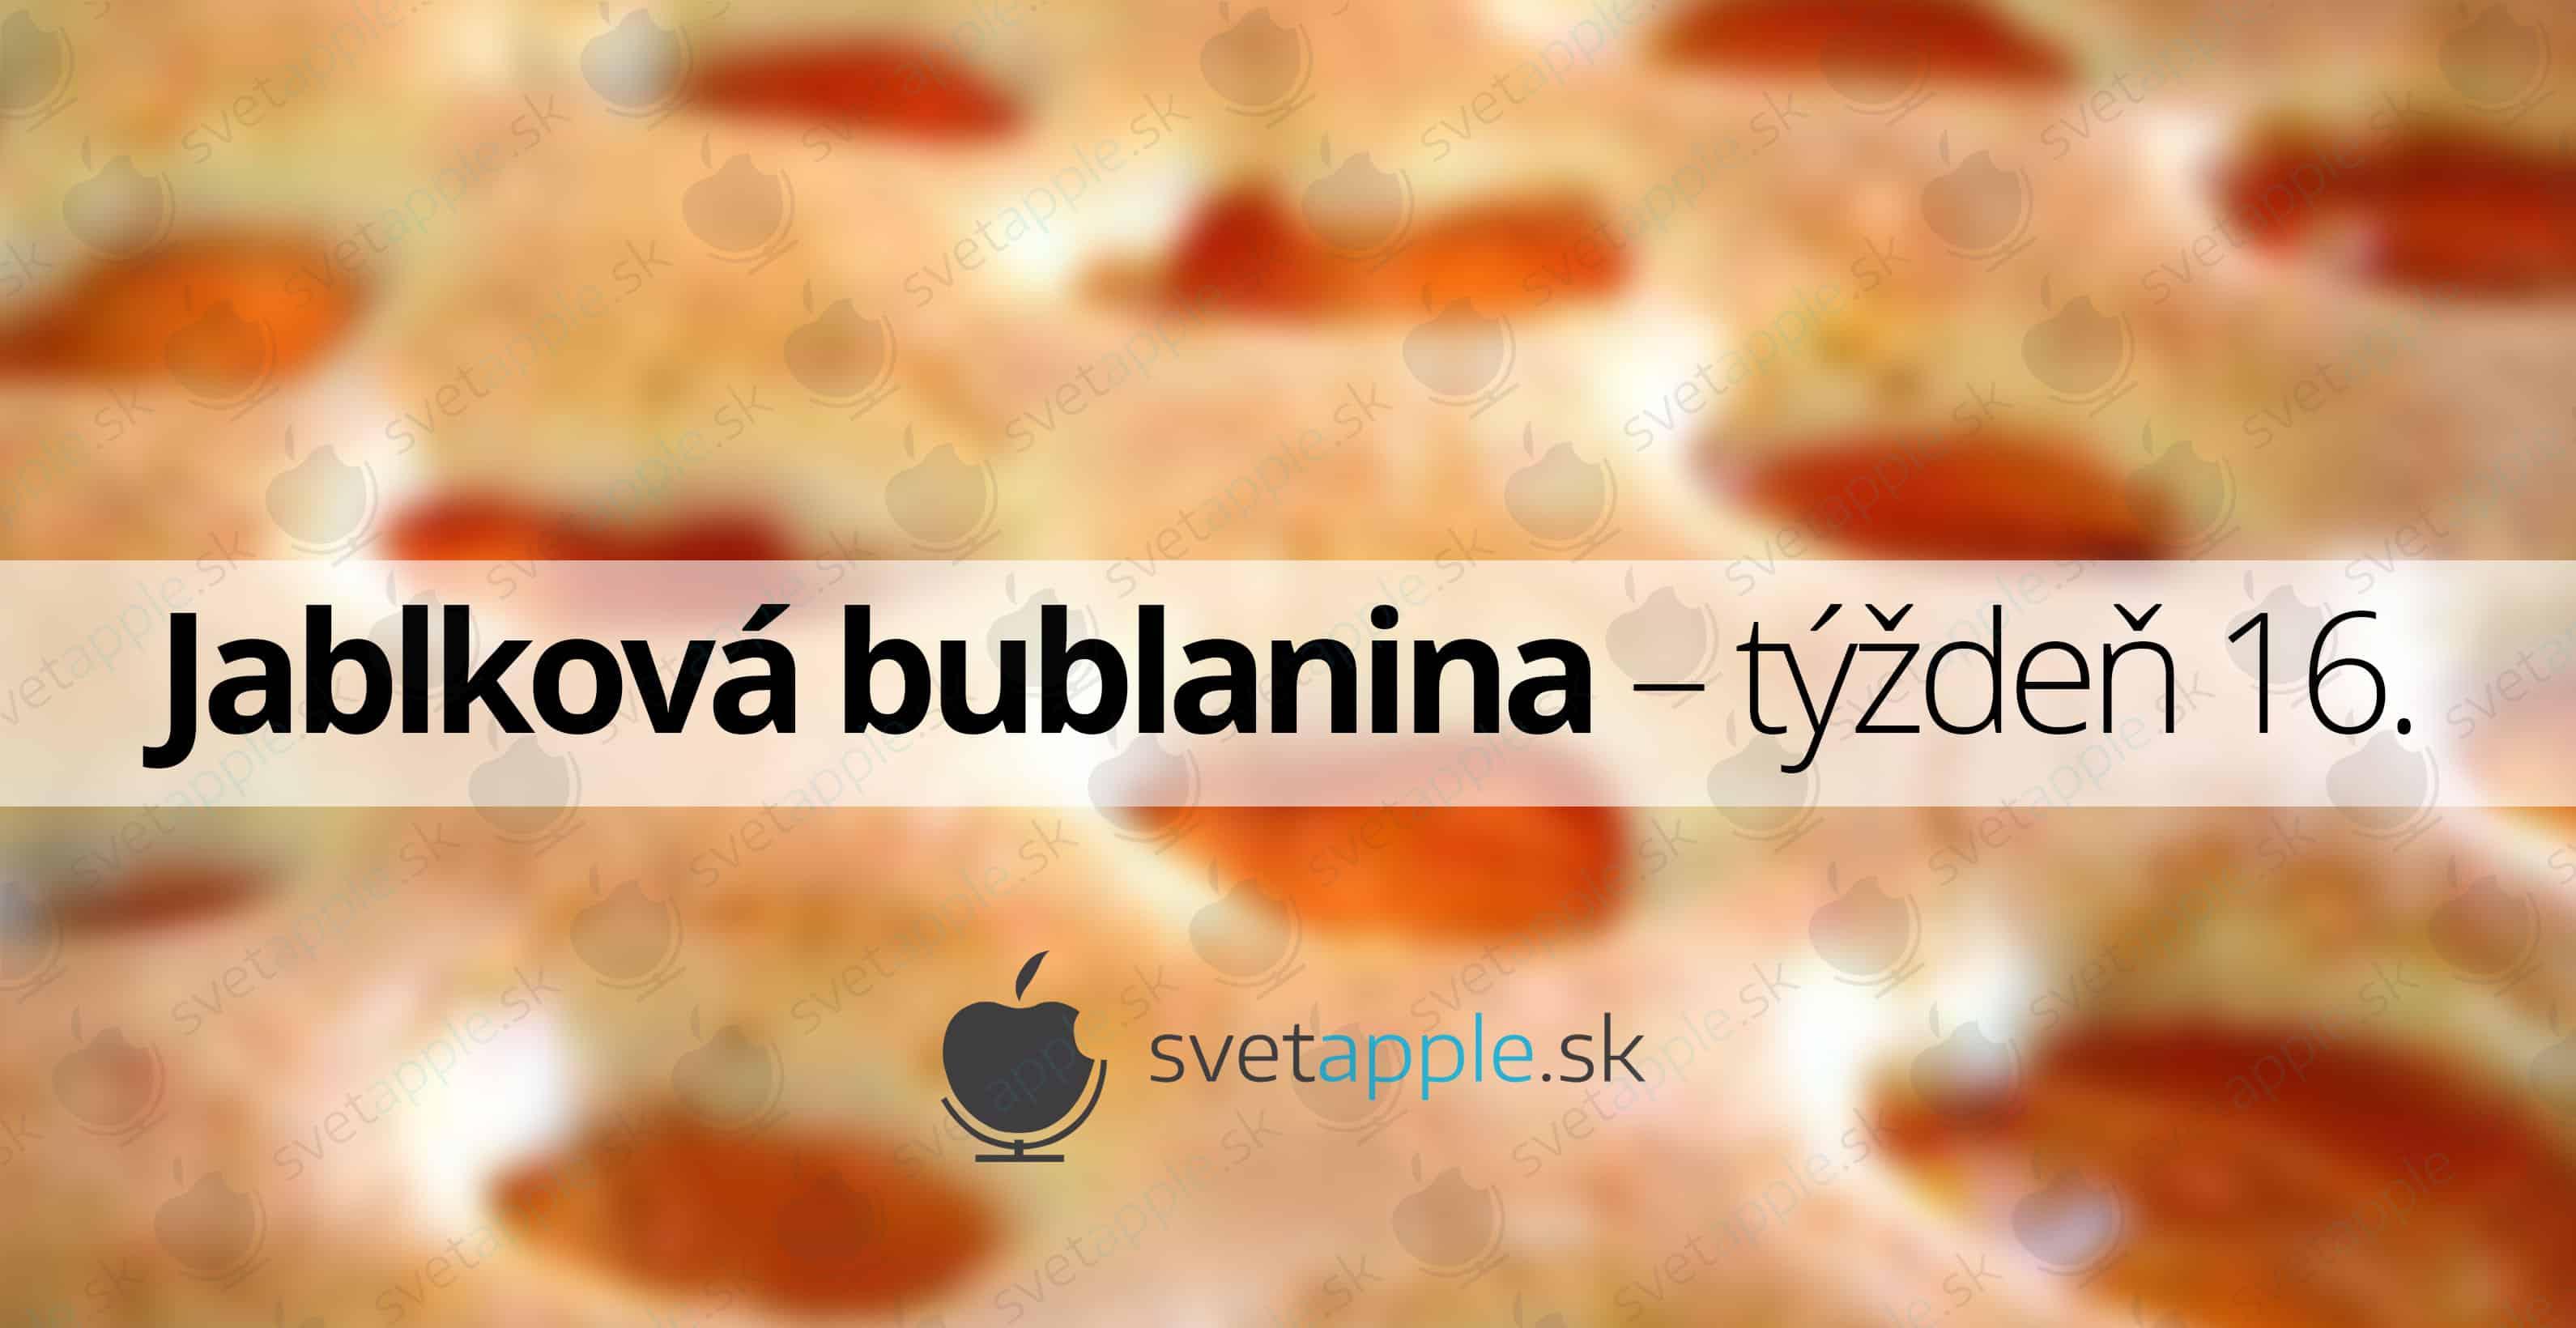 jablkova-bublanina-16.---titulná-fotografia---SvetApple